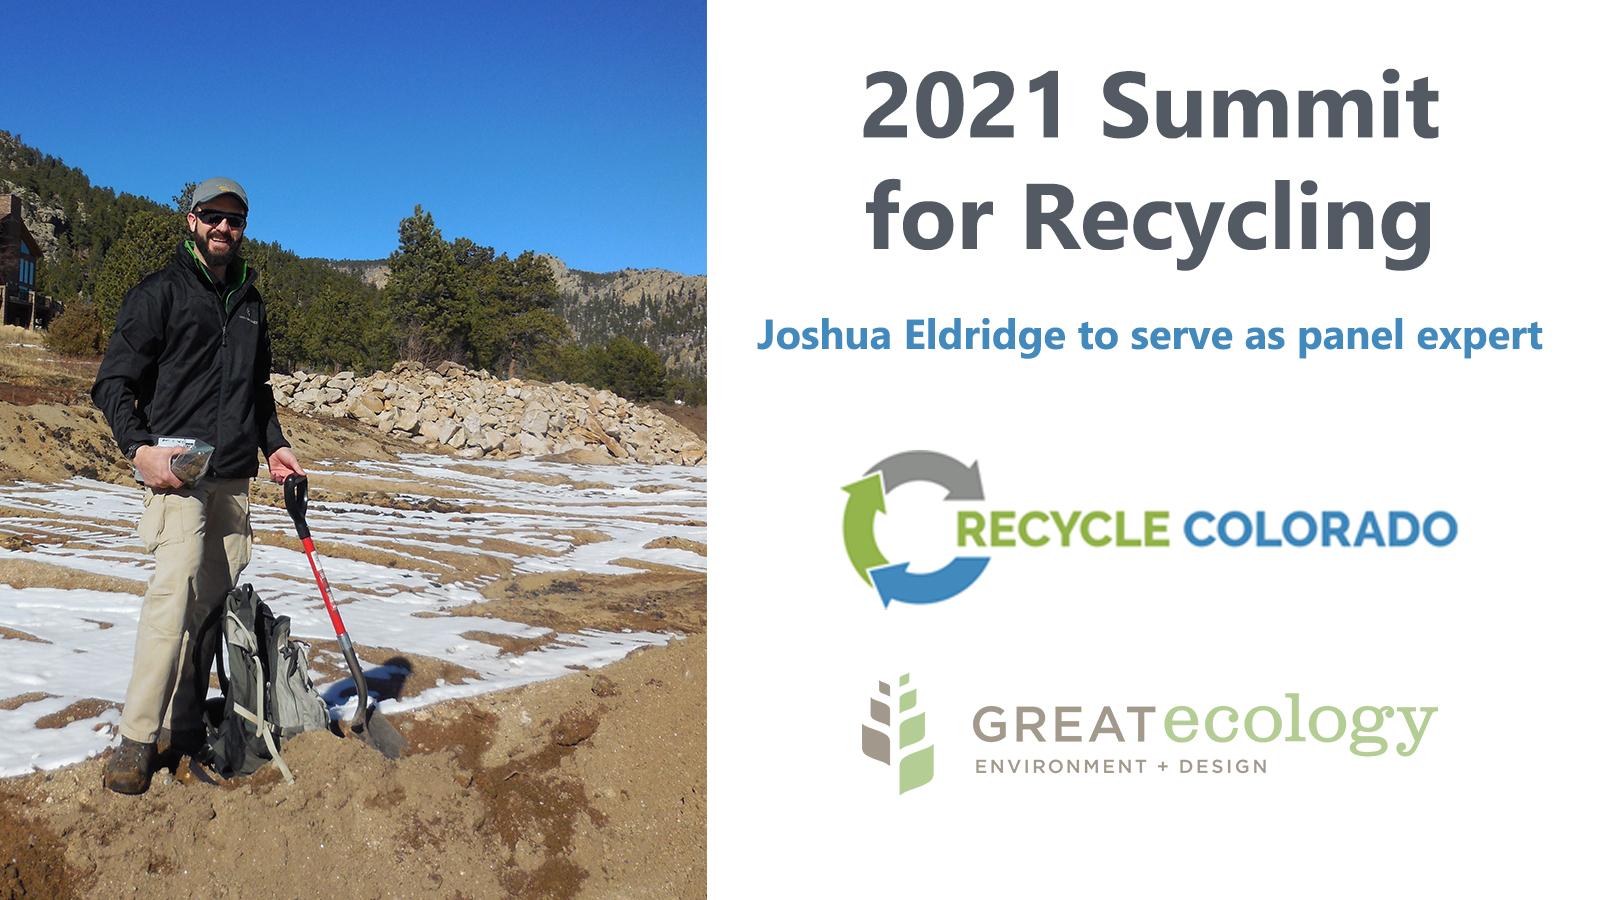 Joshua Eldridge 2021 Summit for Recycling